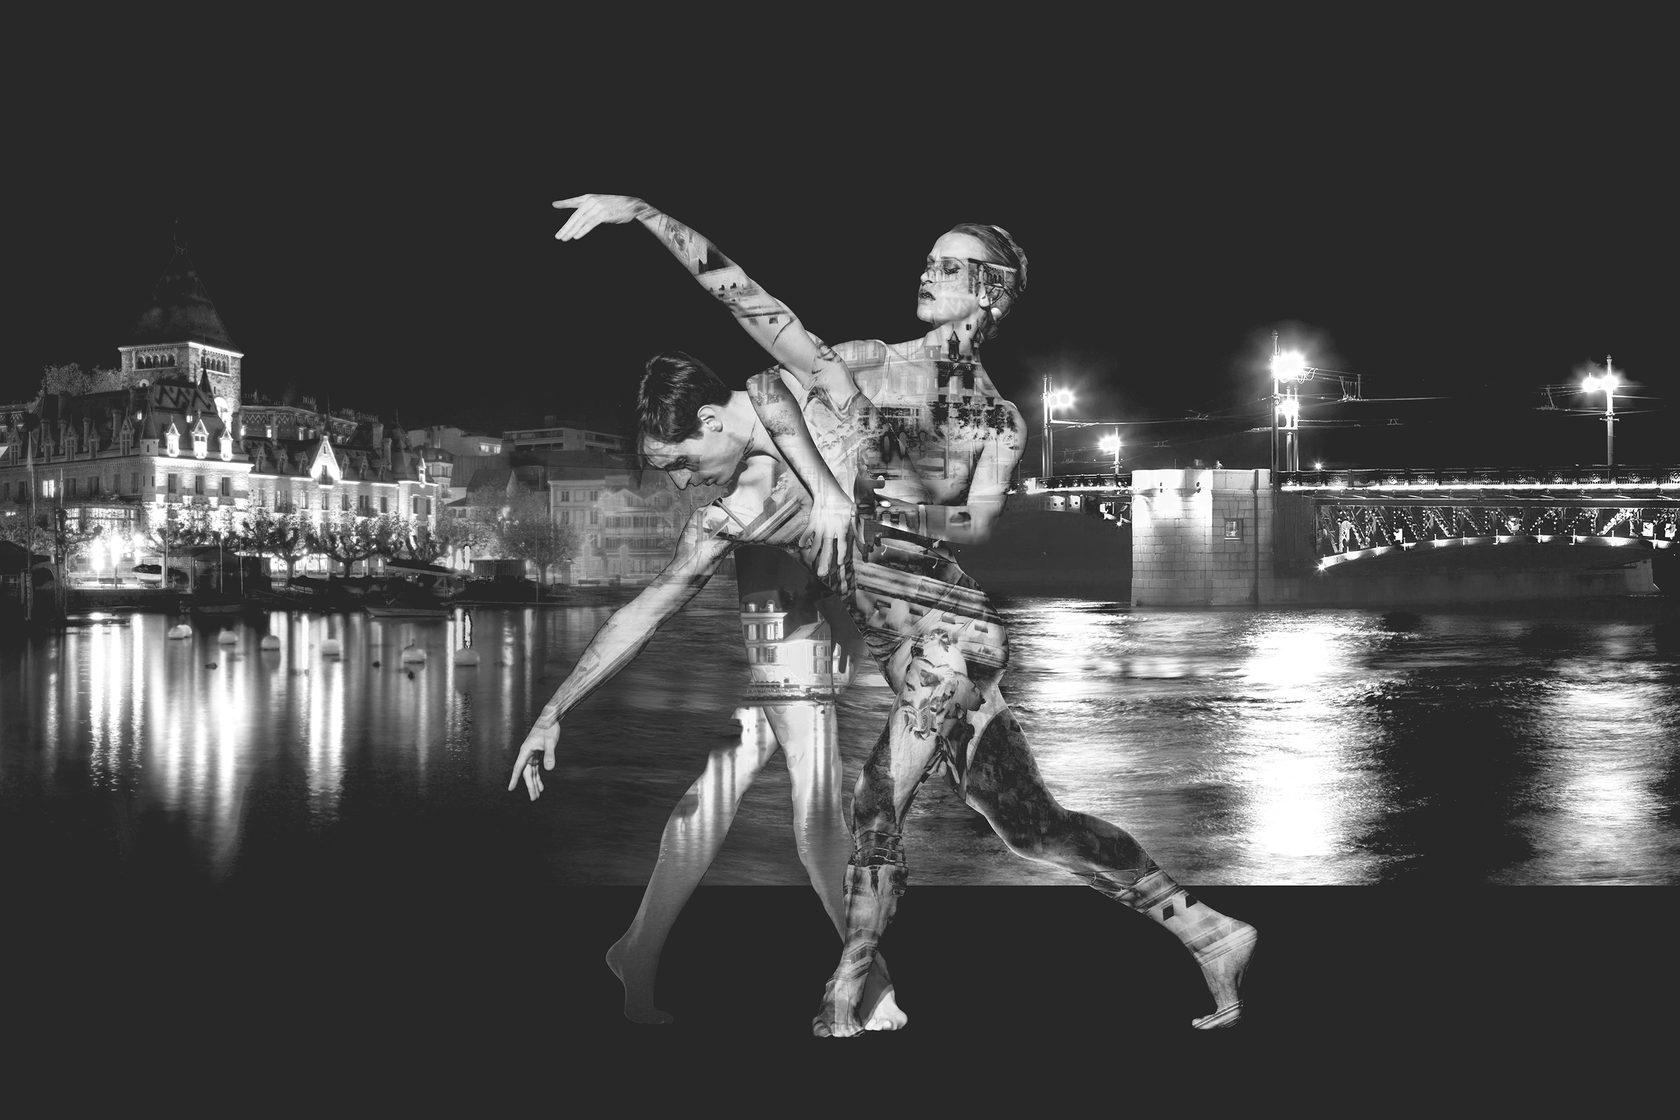 Балет Мориса Бежара, современный балет, французский балет, Bejart Ballet Lausanne, балет Бежара СПБ, PMI, Жиль Роман интервью, Бежар празднует Мориса, М-1 Арена